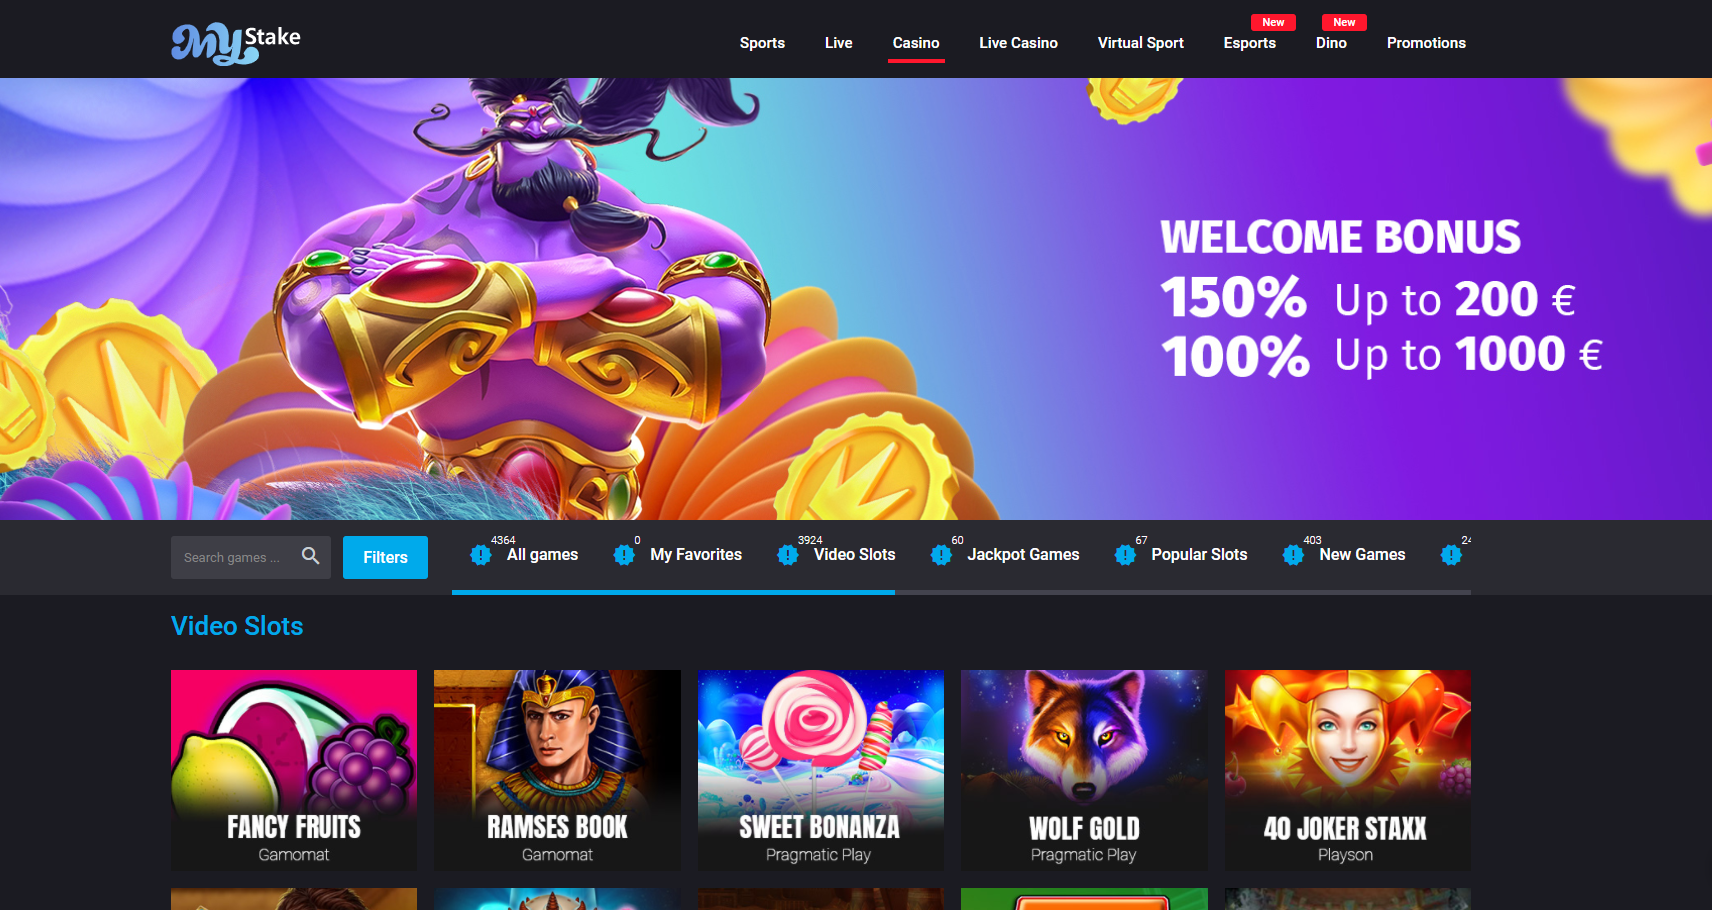 MyStake Casino Review